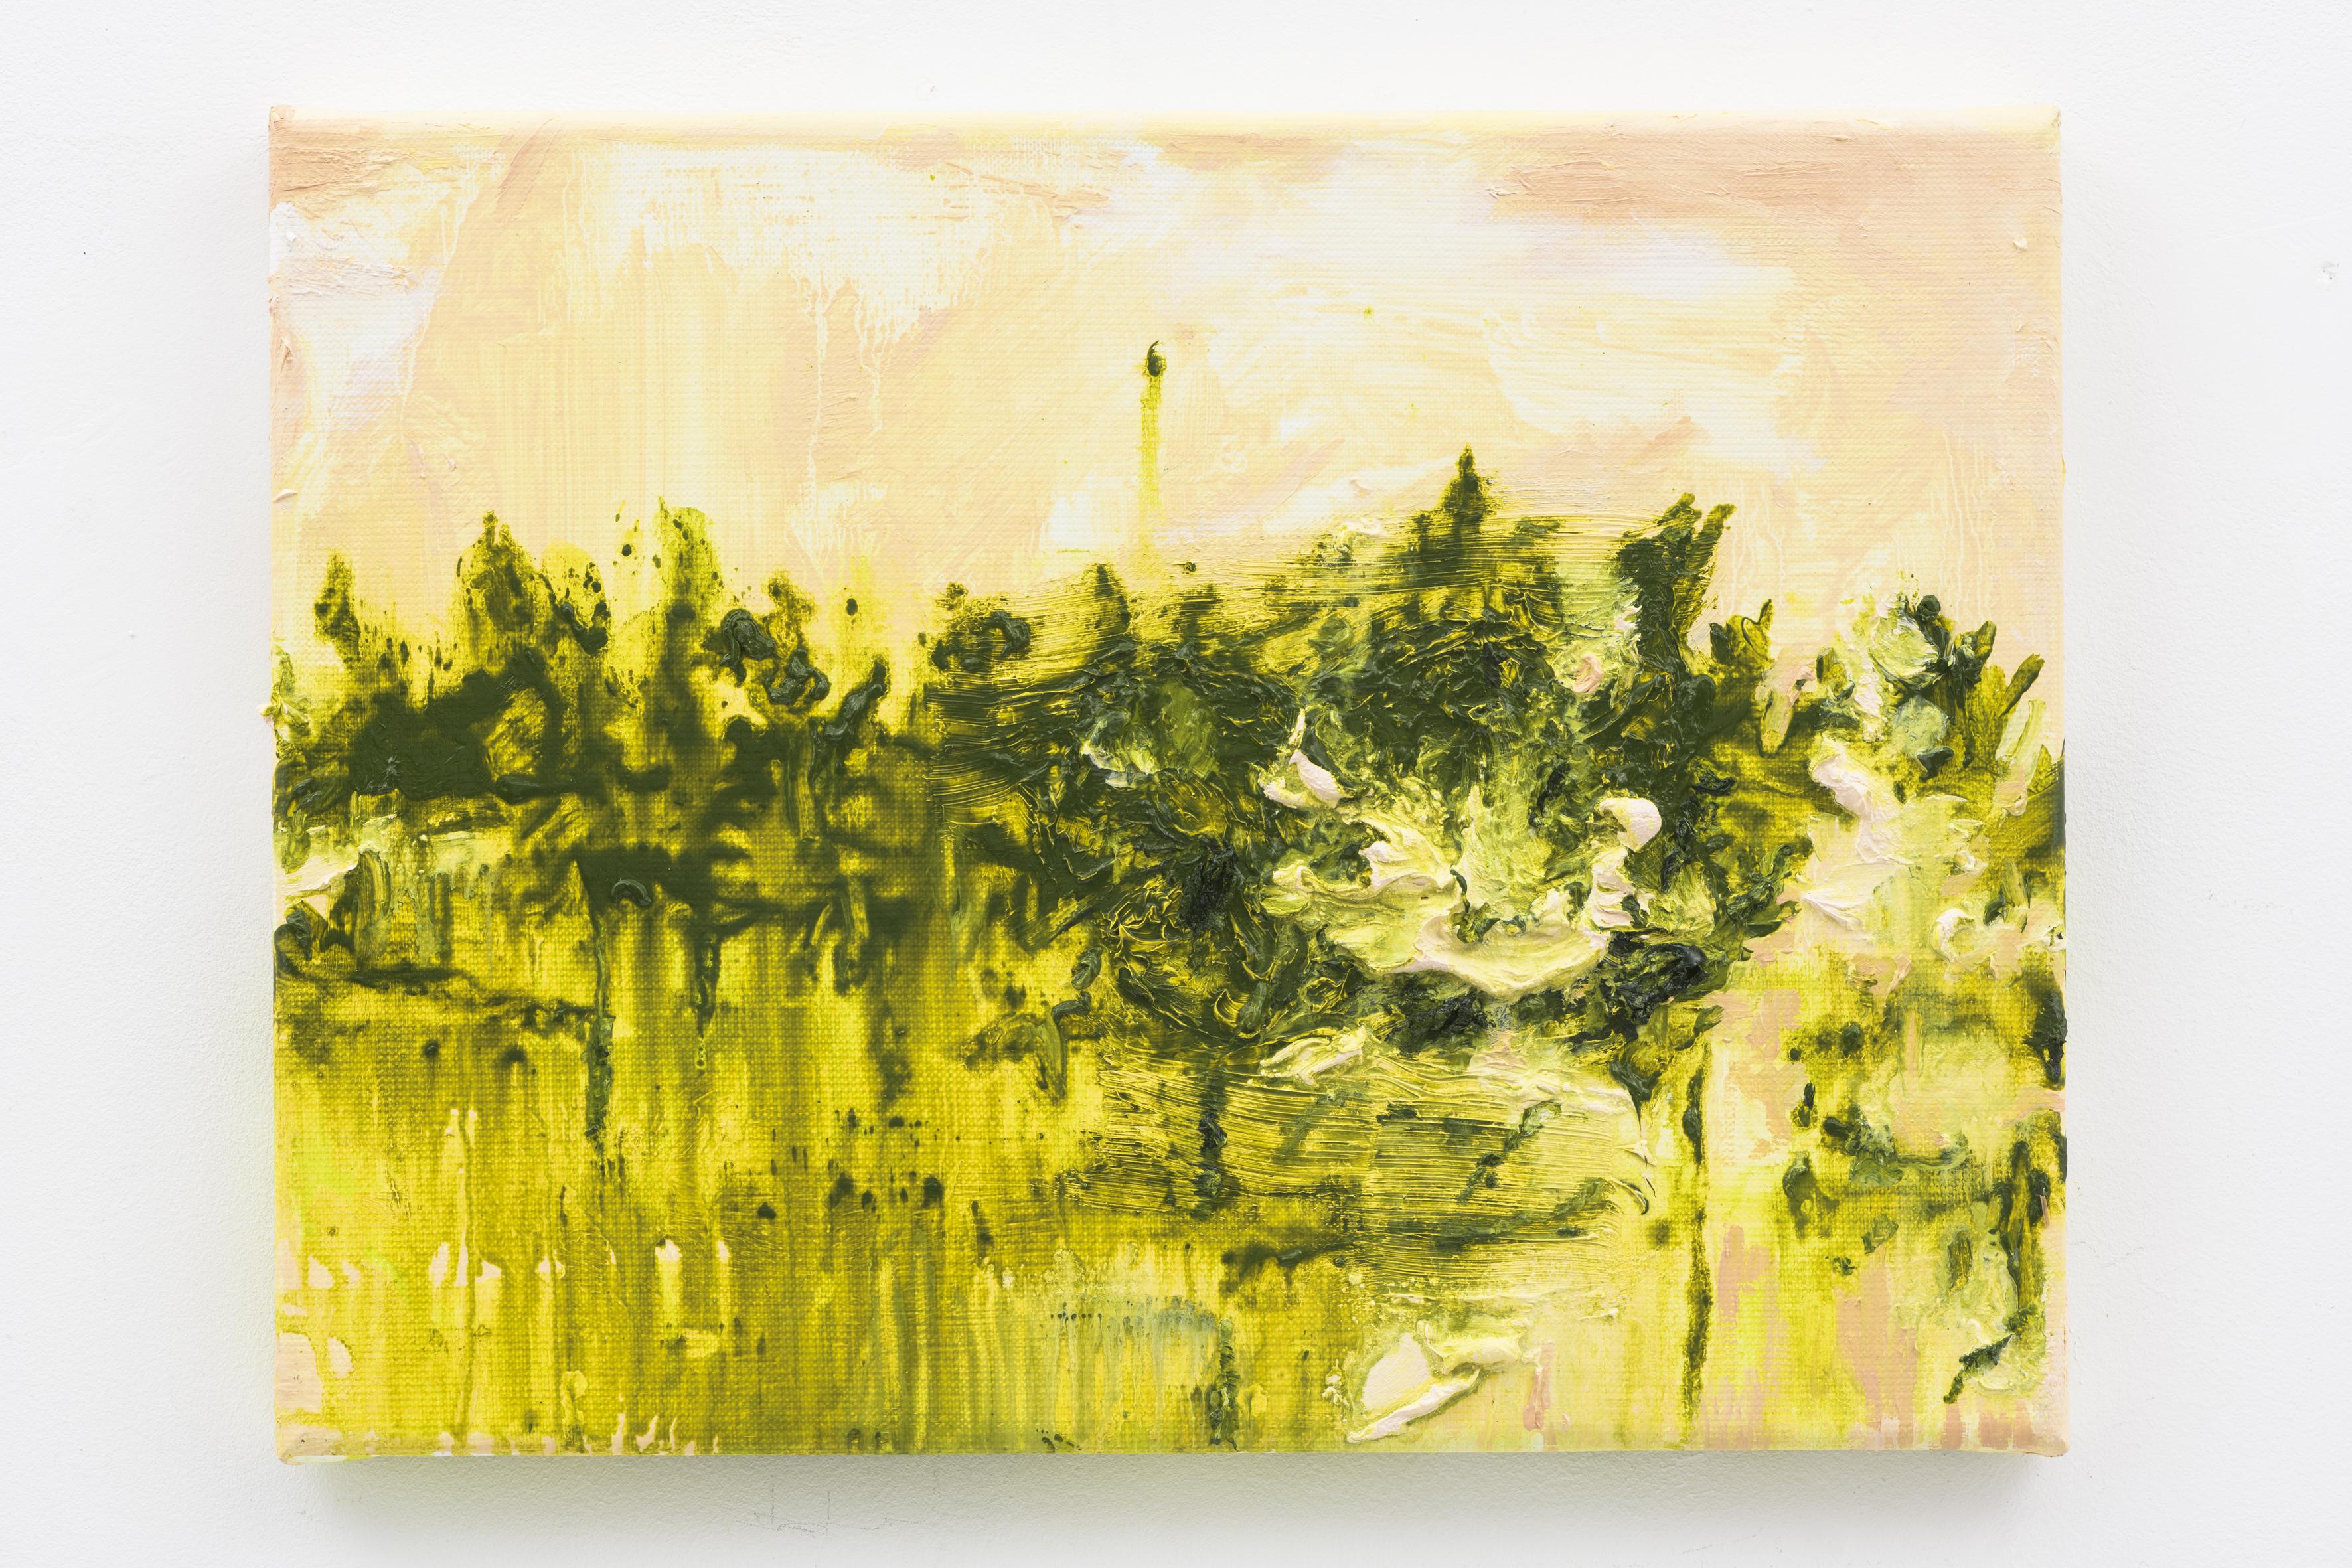 """Stekven"", 30 x 40 cm., oil on linen 2017 (Van Gogh)"